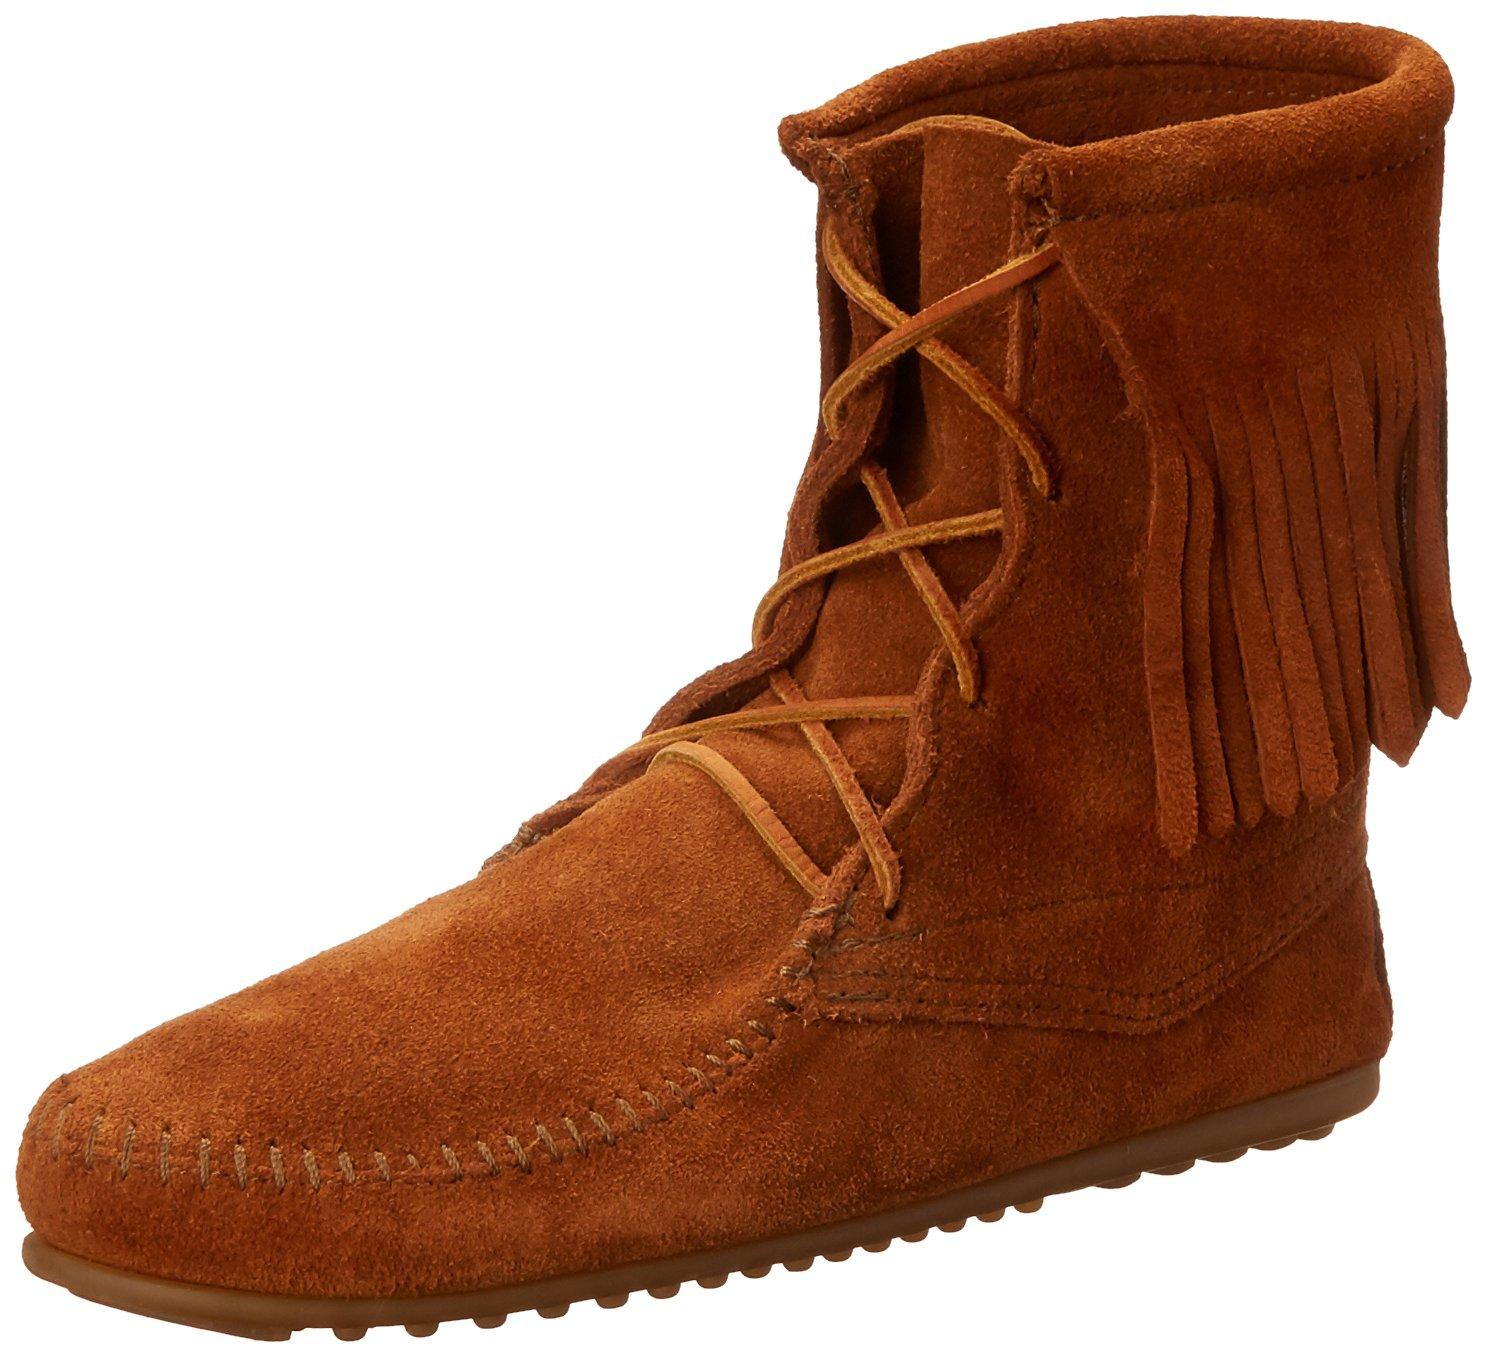 Minnetonka Women's Tramper Ankle Hi Boot B000EX8E7O 9 B(M) US Brown